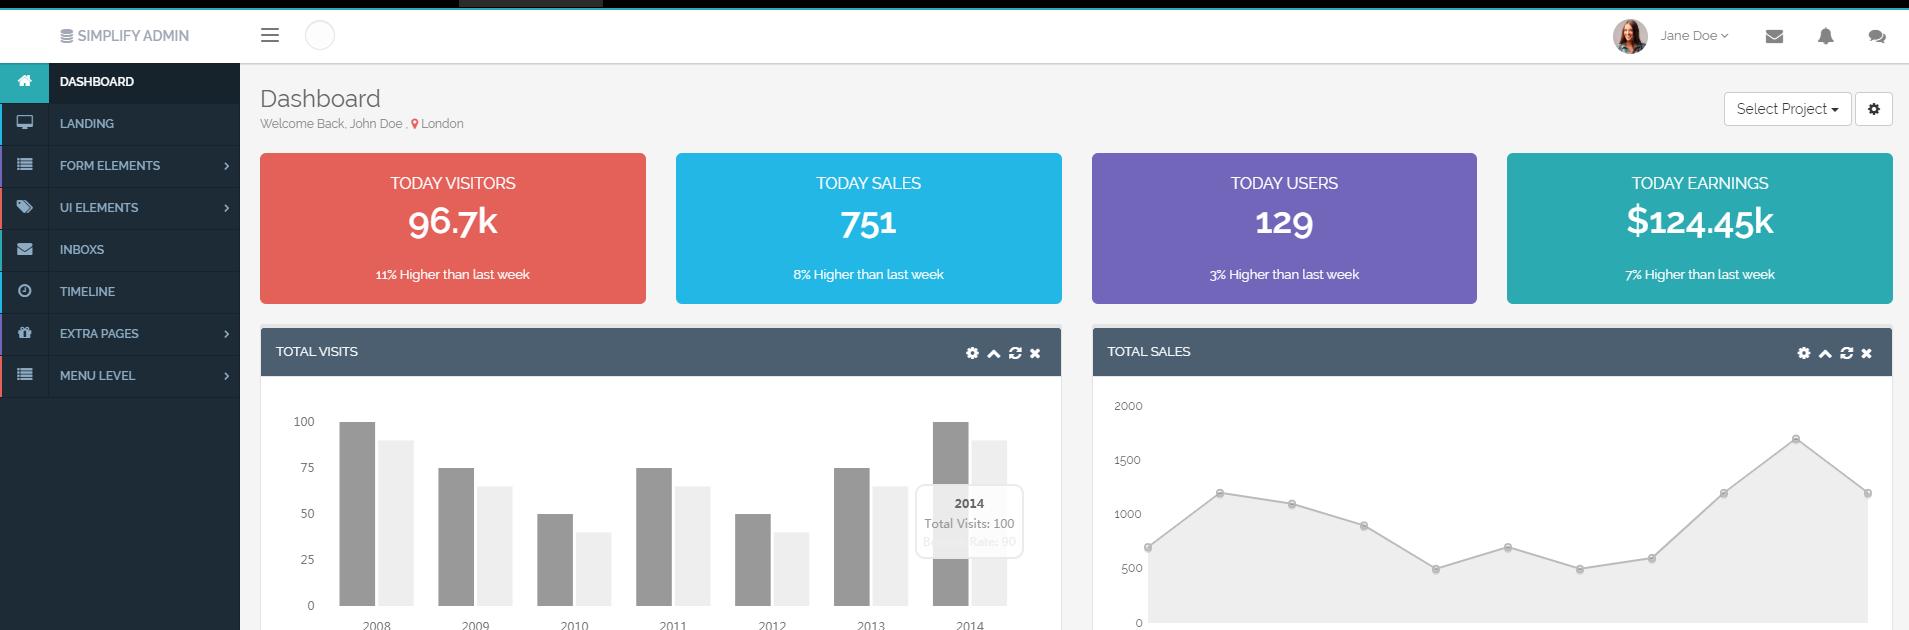 Simplify天蓝色风格自适应后台网站模板